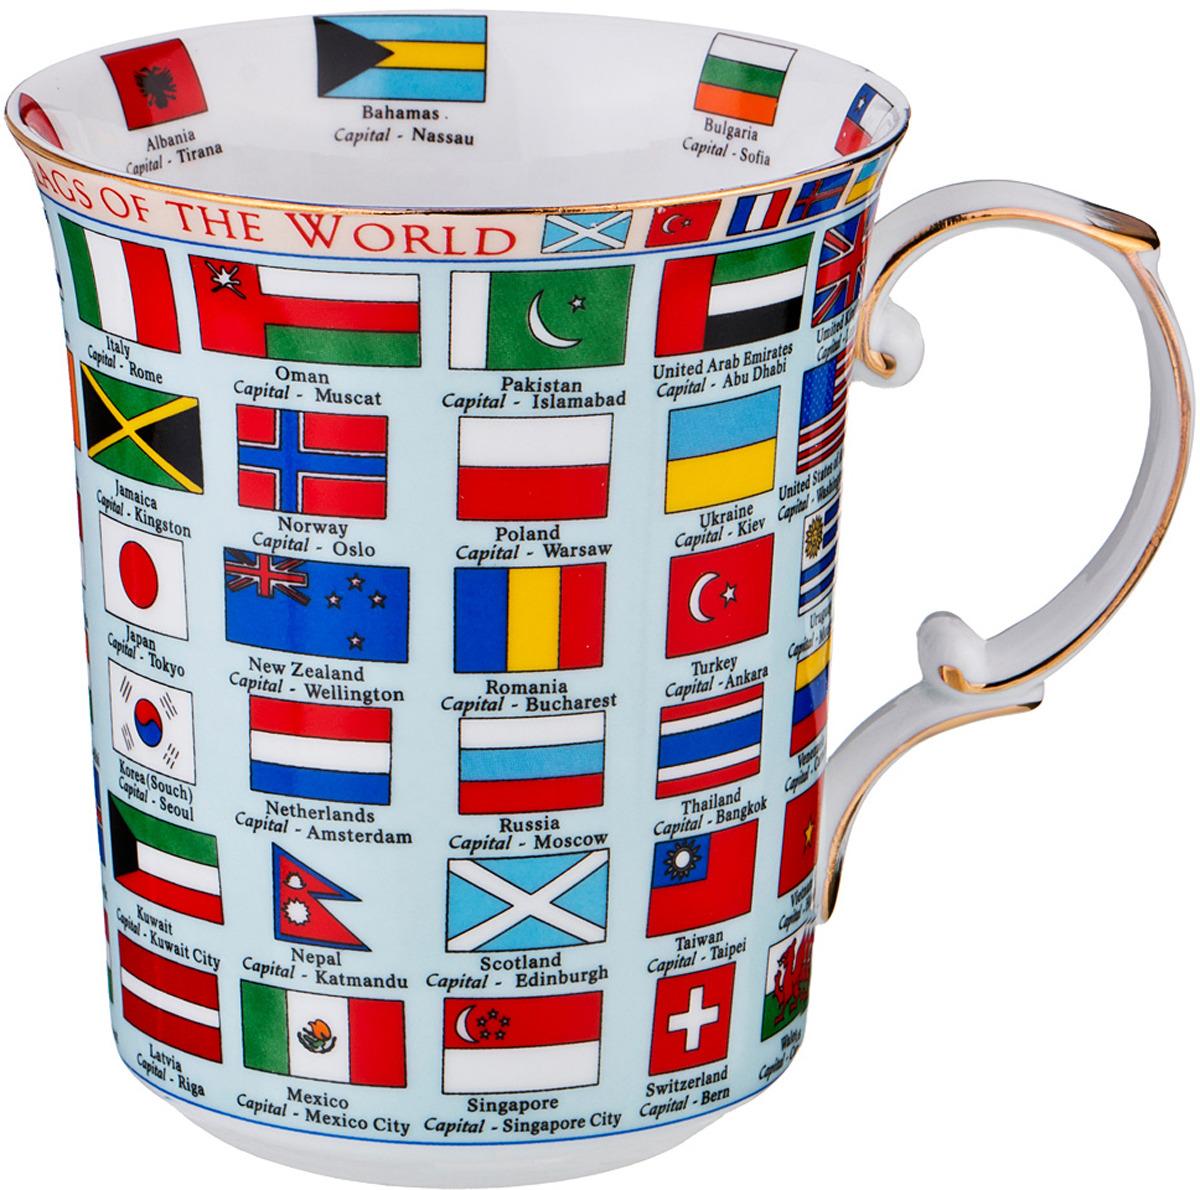 Кружка Lefard Флаги стран мира, 500 мл. M3532 кружка lefard флаги стран мира 500 мл m3532